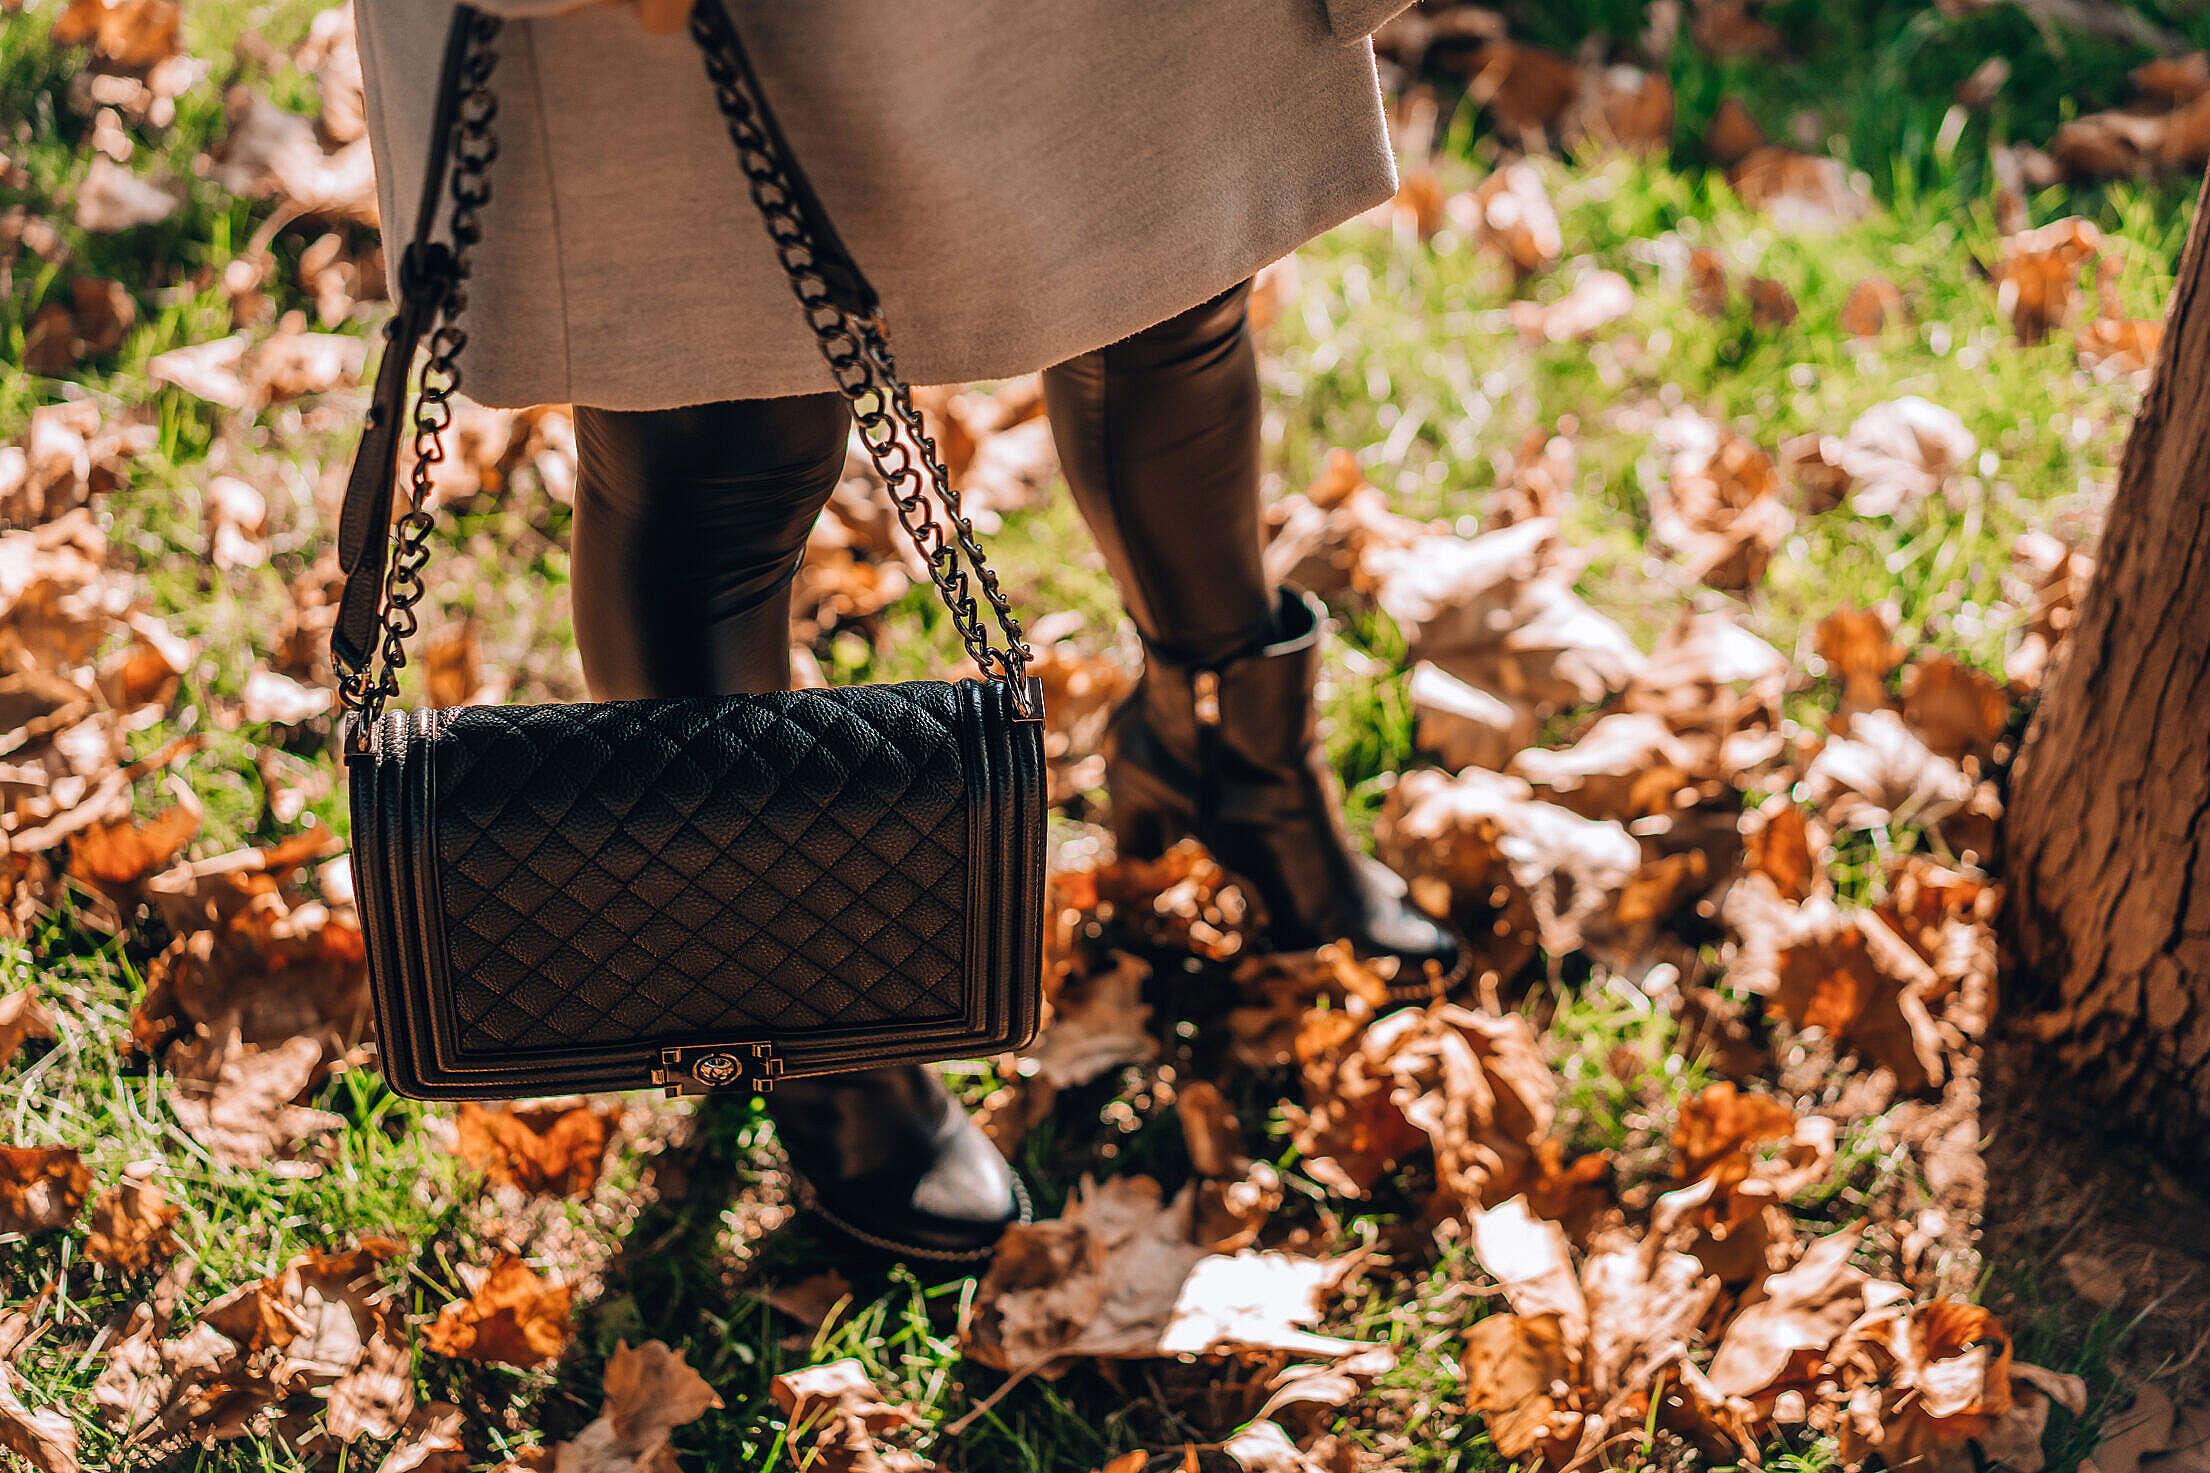 Autumn Fashion Woman with Leather Bag Free Stock Photo